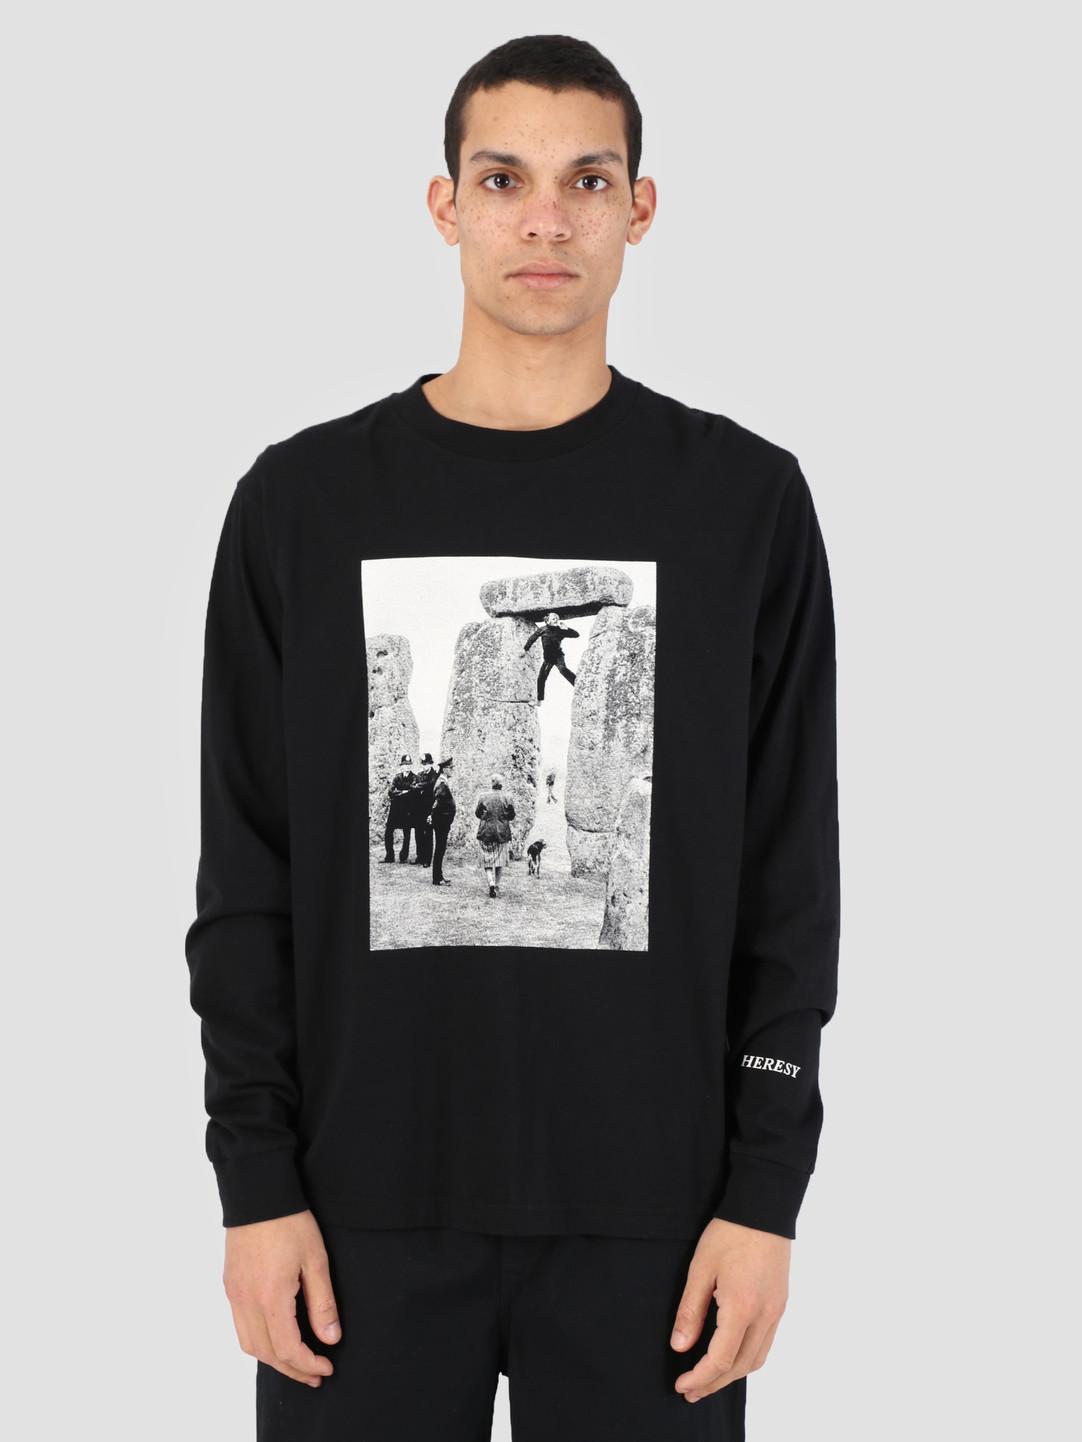 Heresy Heresy Henge T-Shirt Black HSS19-T05B